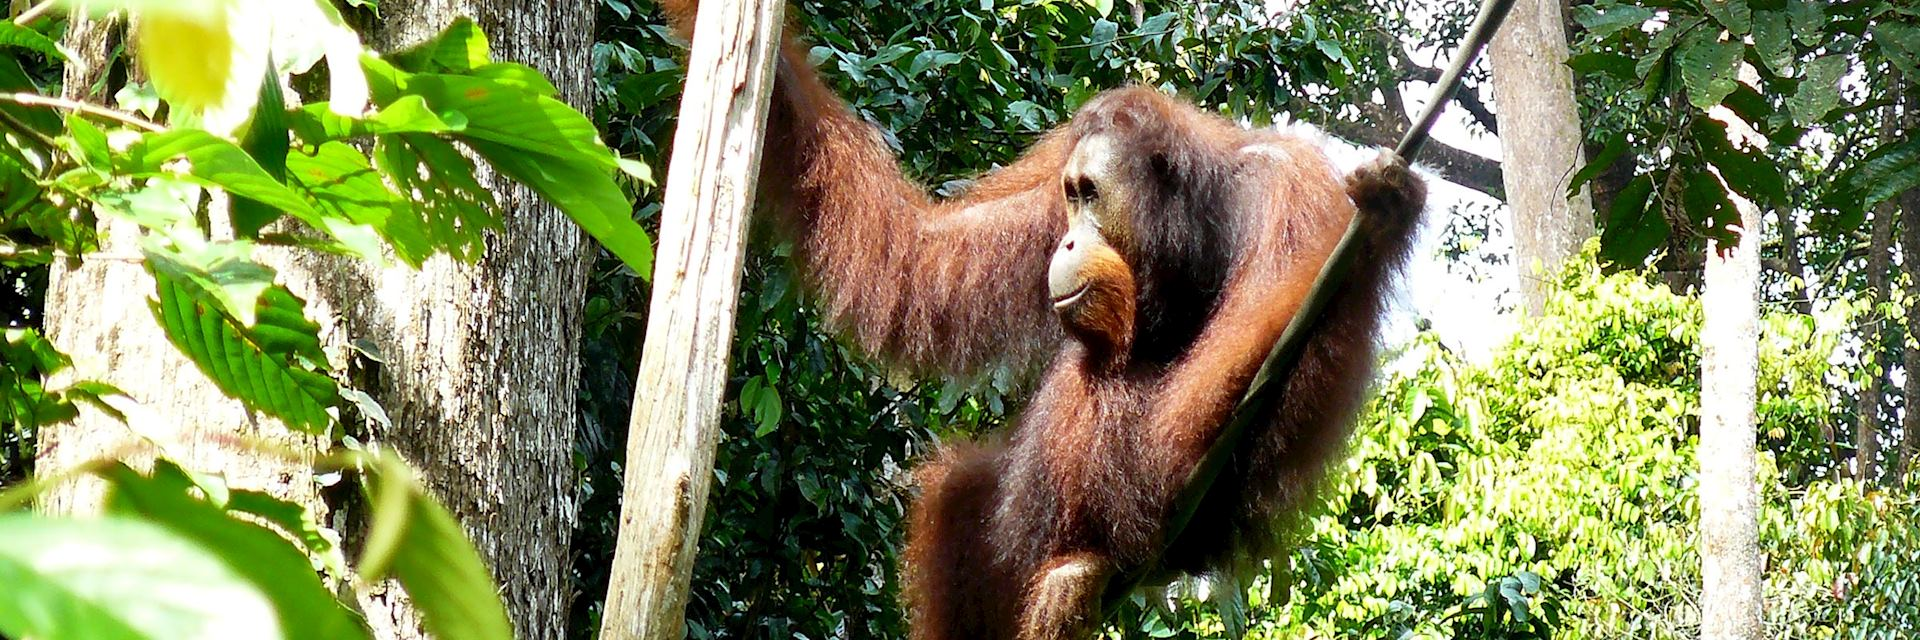 Orangutan in Sepilok, Borneo